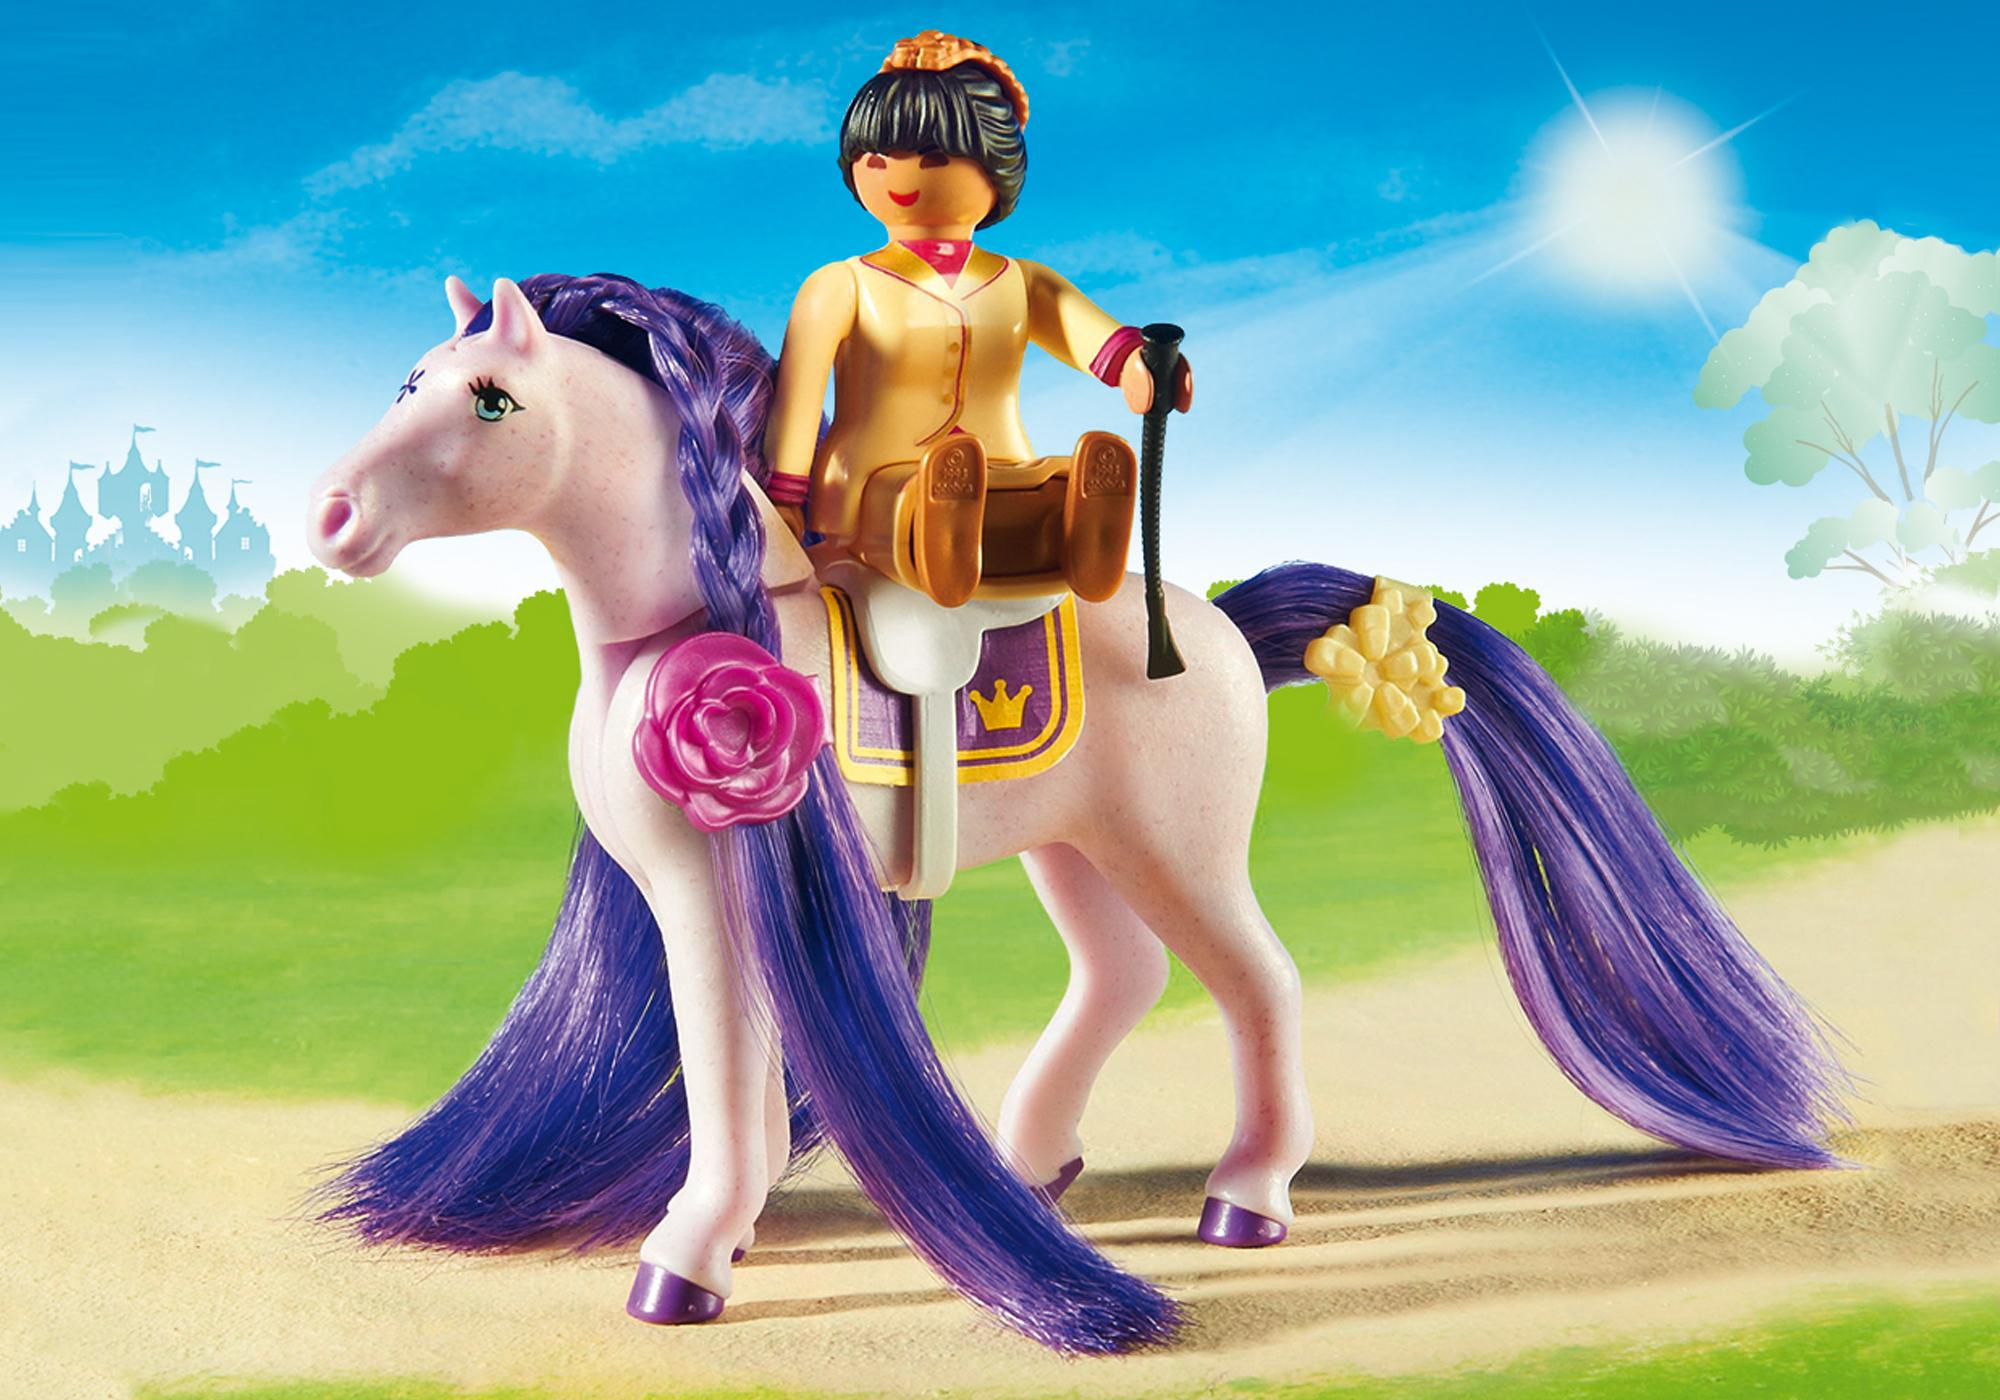 http://media.playmobil.com/i/playmobil/6855_product_extra1/Замок Принцессы: Королевская конюшня